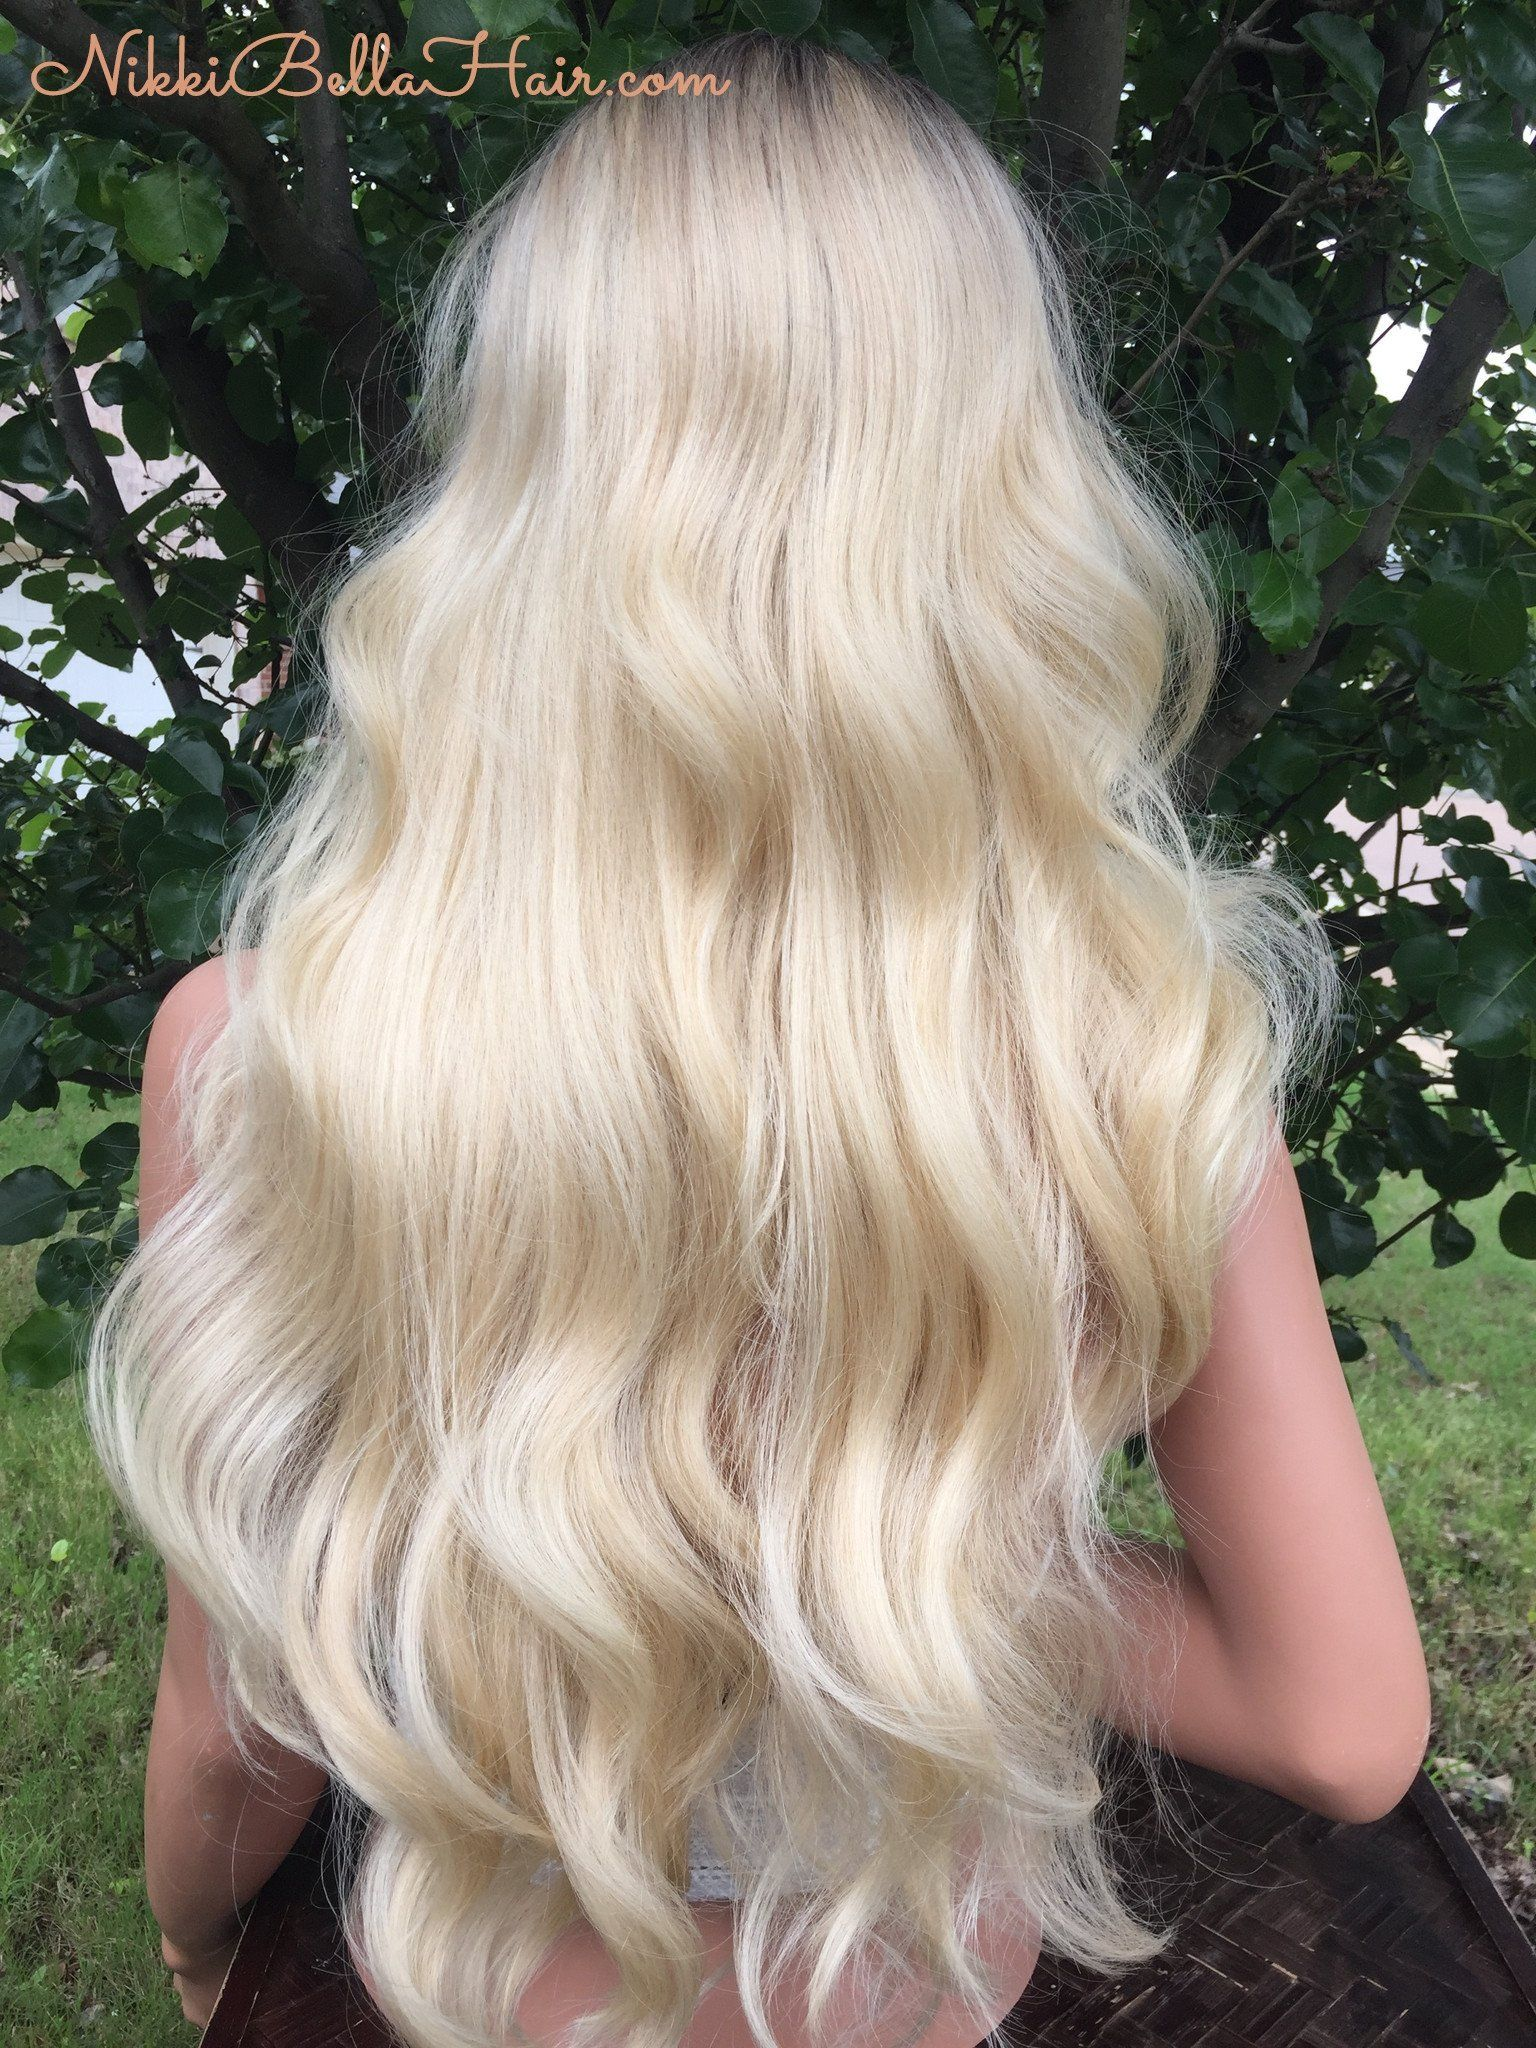 Light Platnium Blond Ombre 20 Full Wig #blondeombre